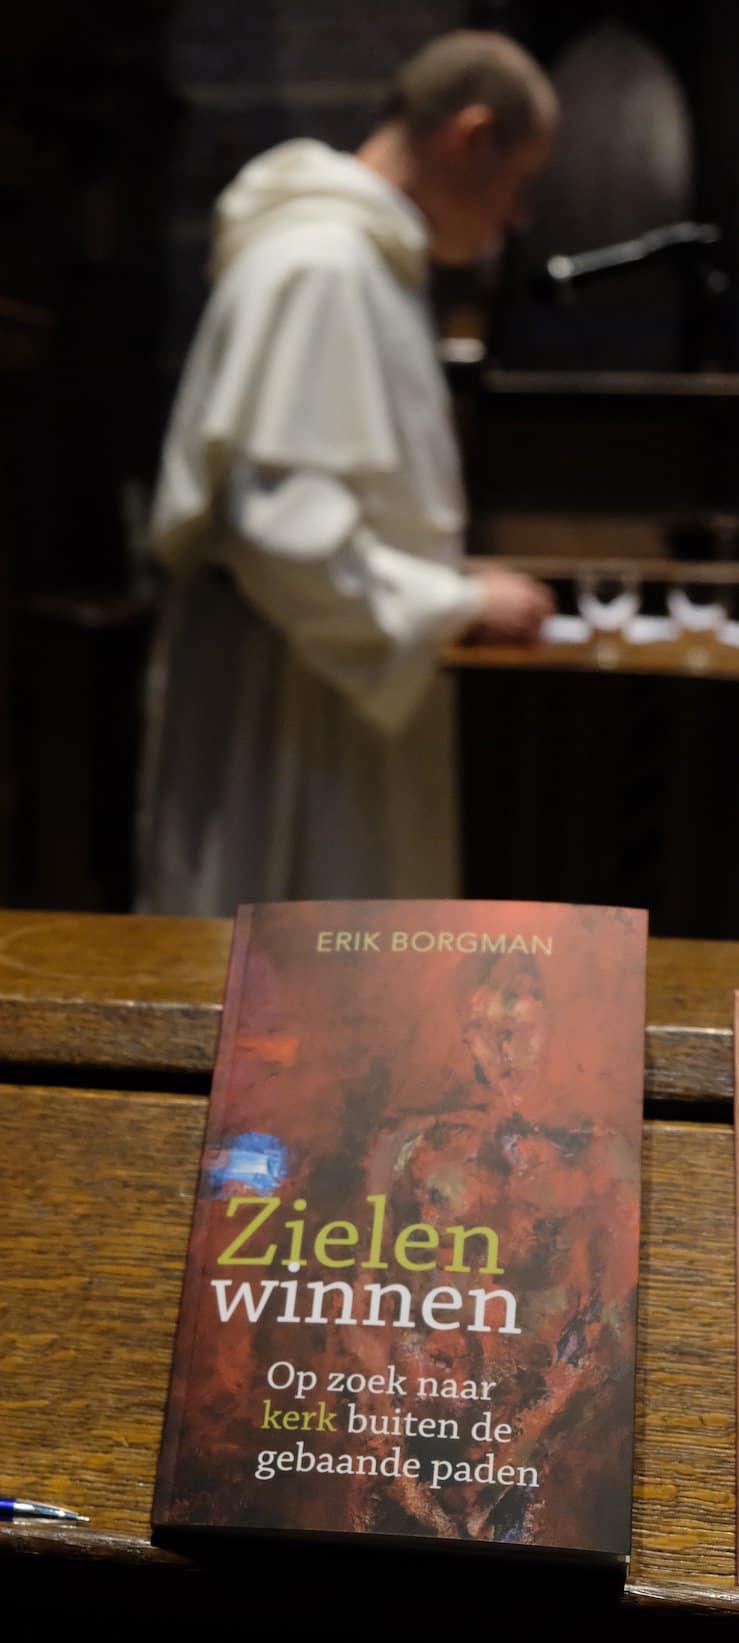 Stefan Mangnus Zwolle boekpres Erik Borgman 301117-2